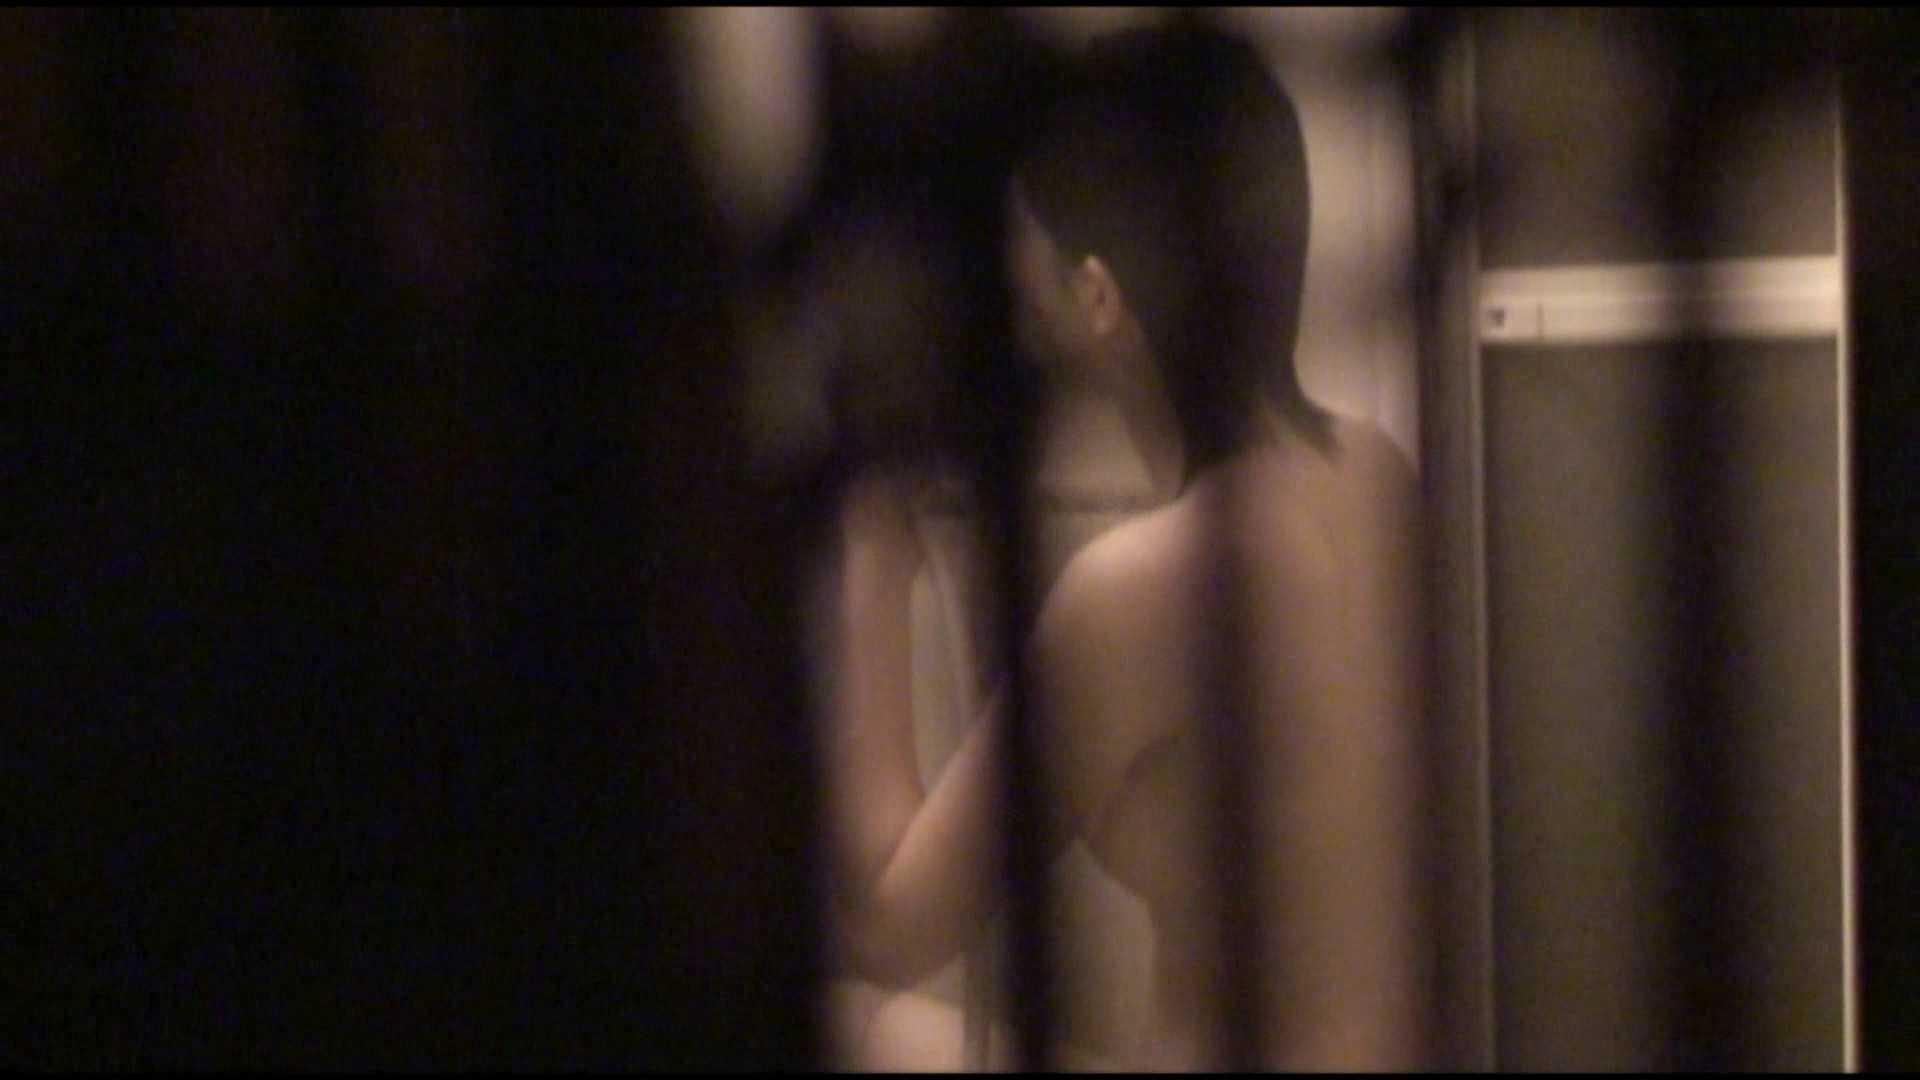 vol.05最高の極上美人!可愛い彼女の裸体をどうぞ!風呂上り鏡チェックも必見! 美人  99PIX 89